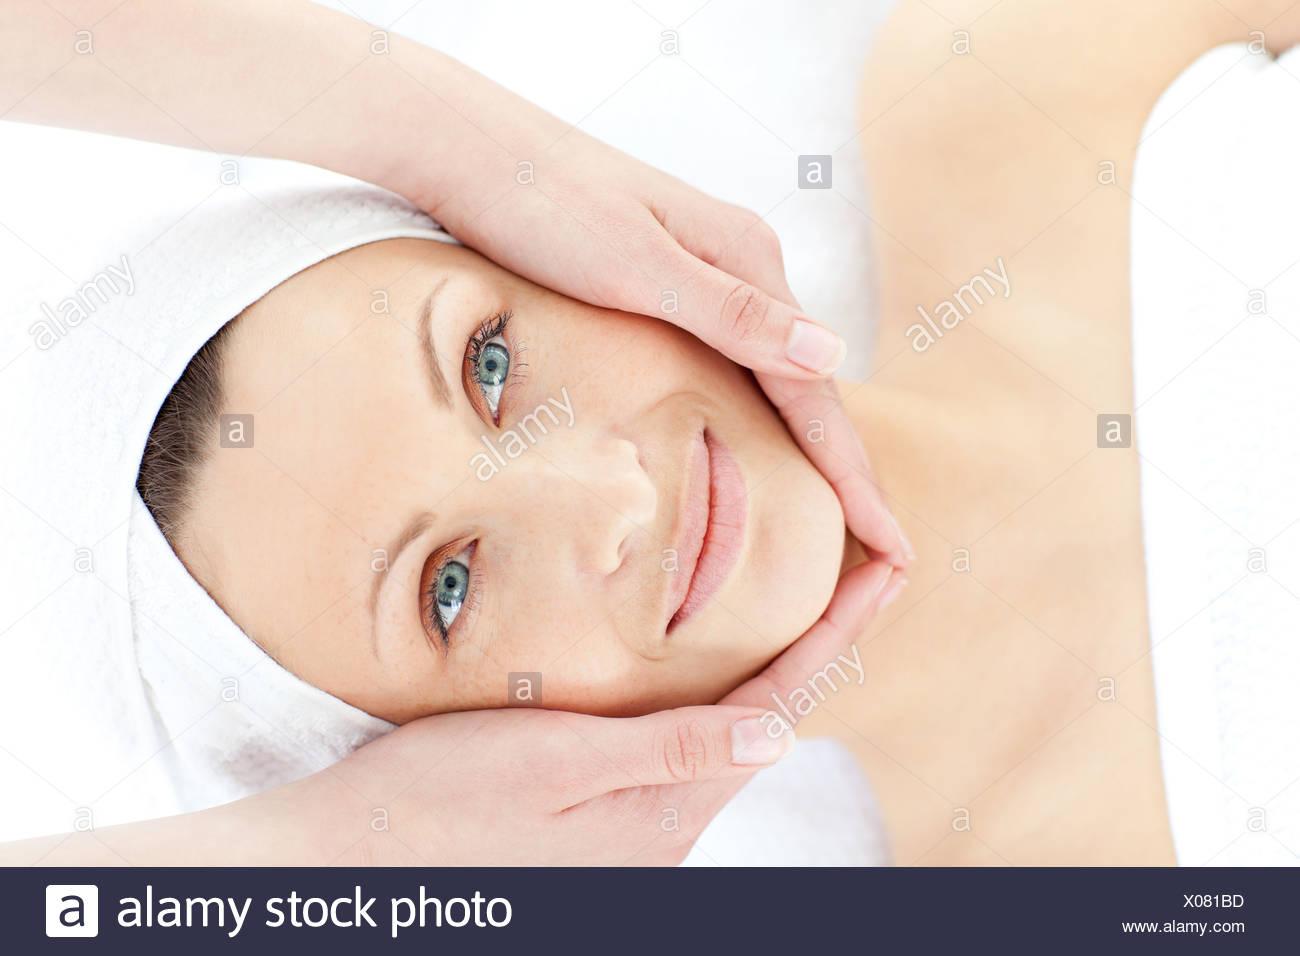 Charming young woman enjoying a facial massage Stock Photo